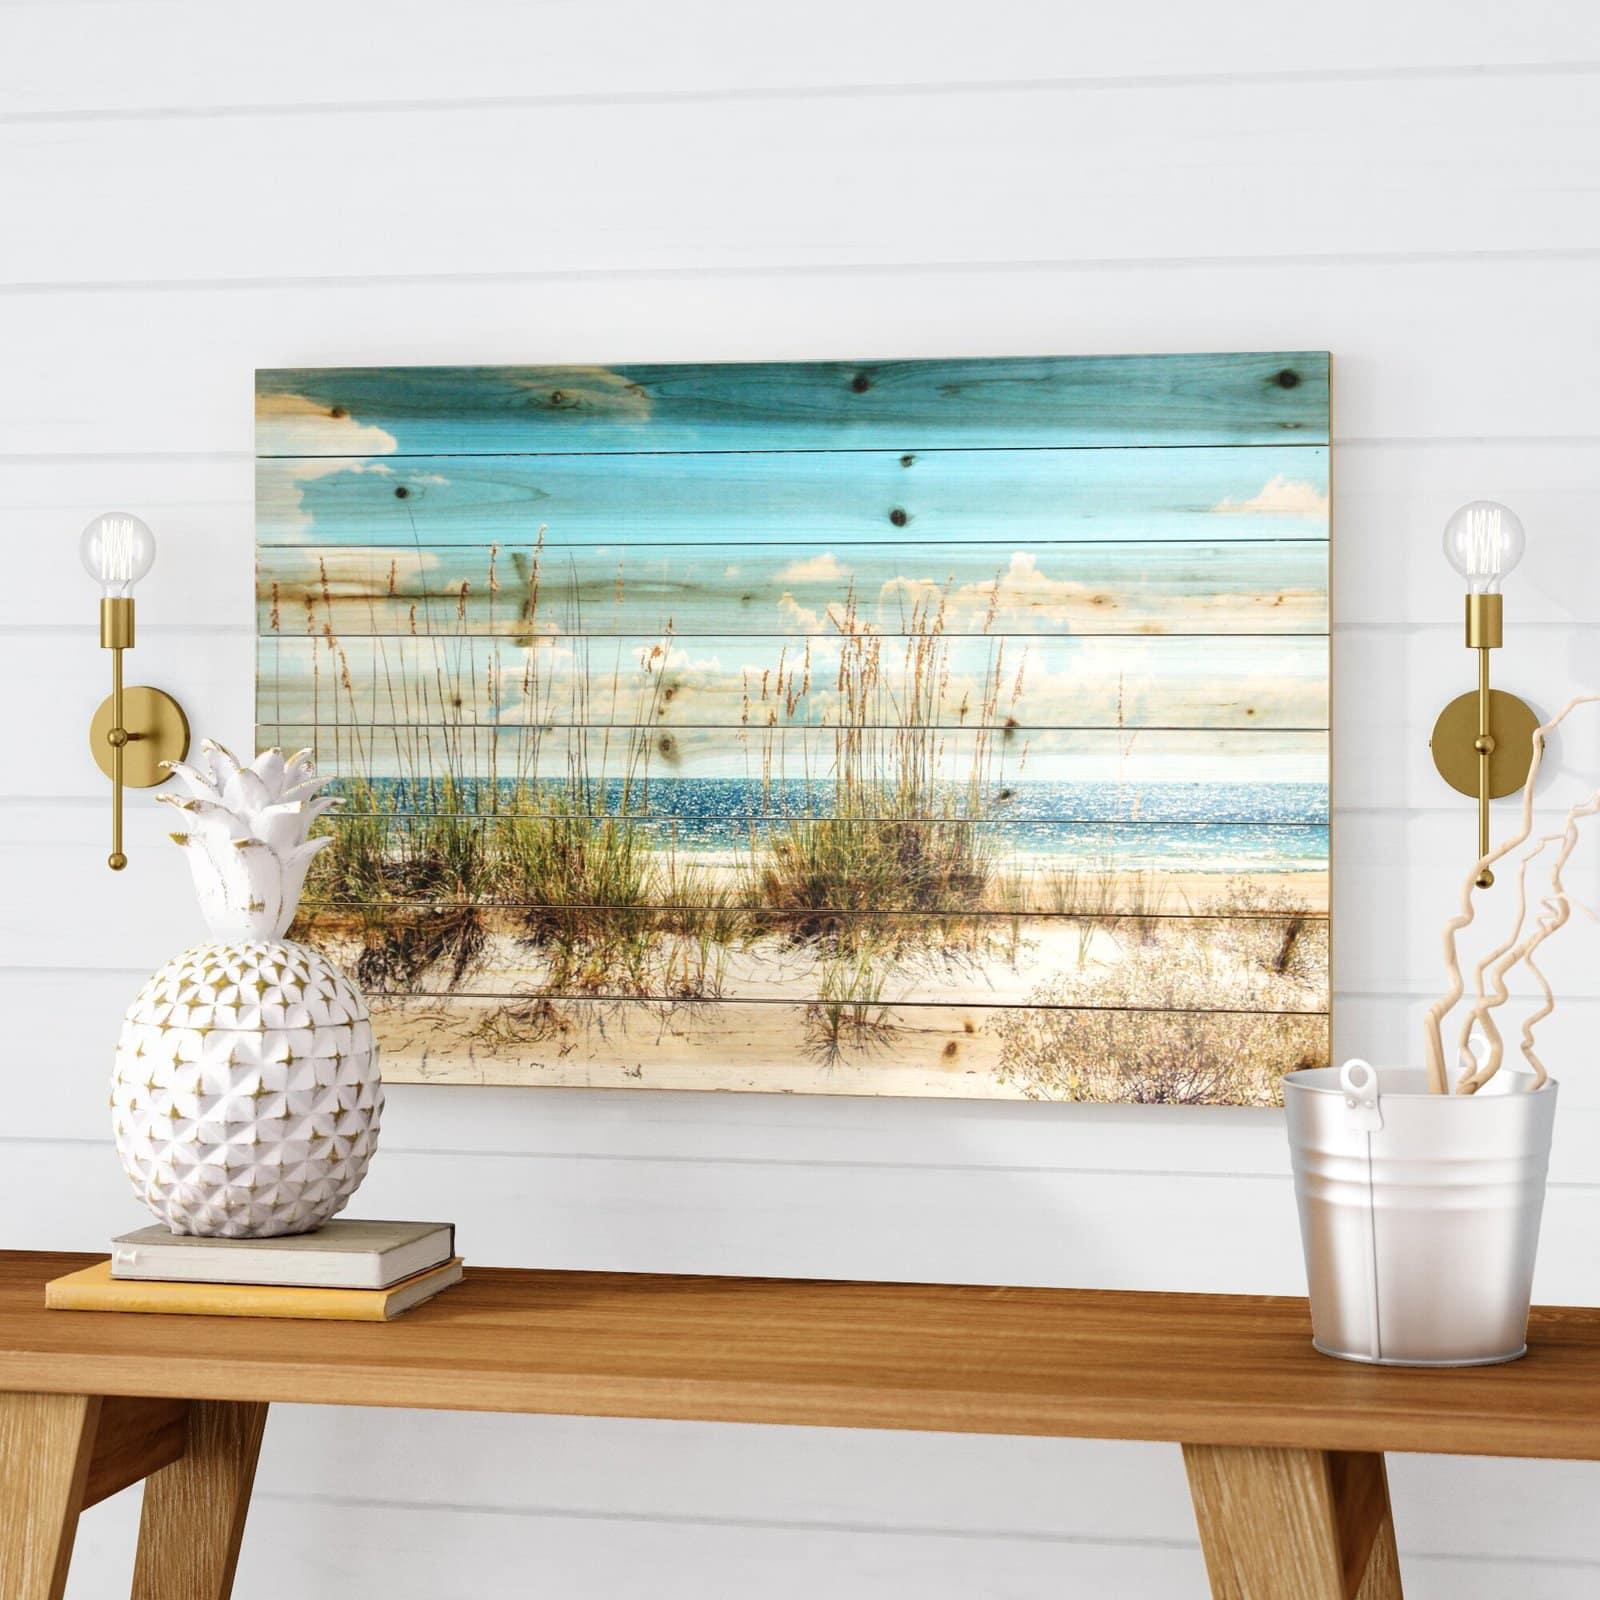 Sand Dunes, Photographic Print on Wood